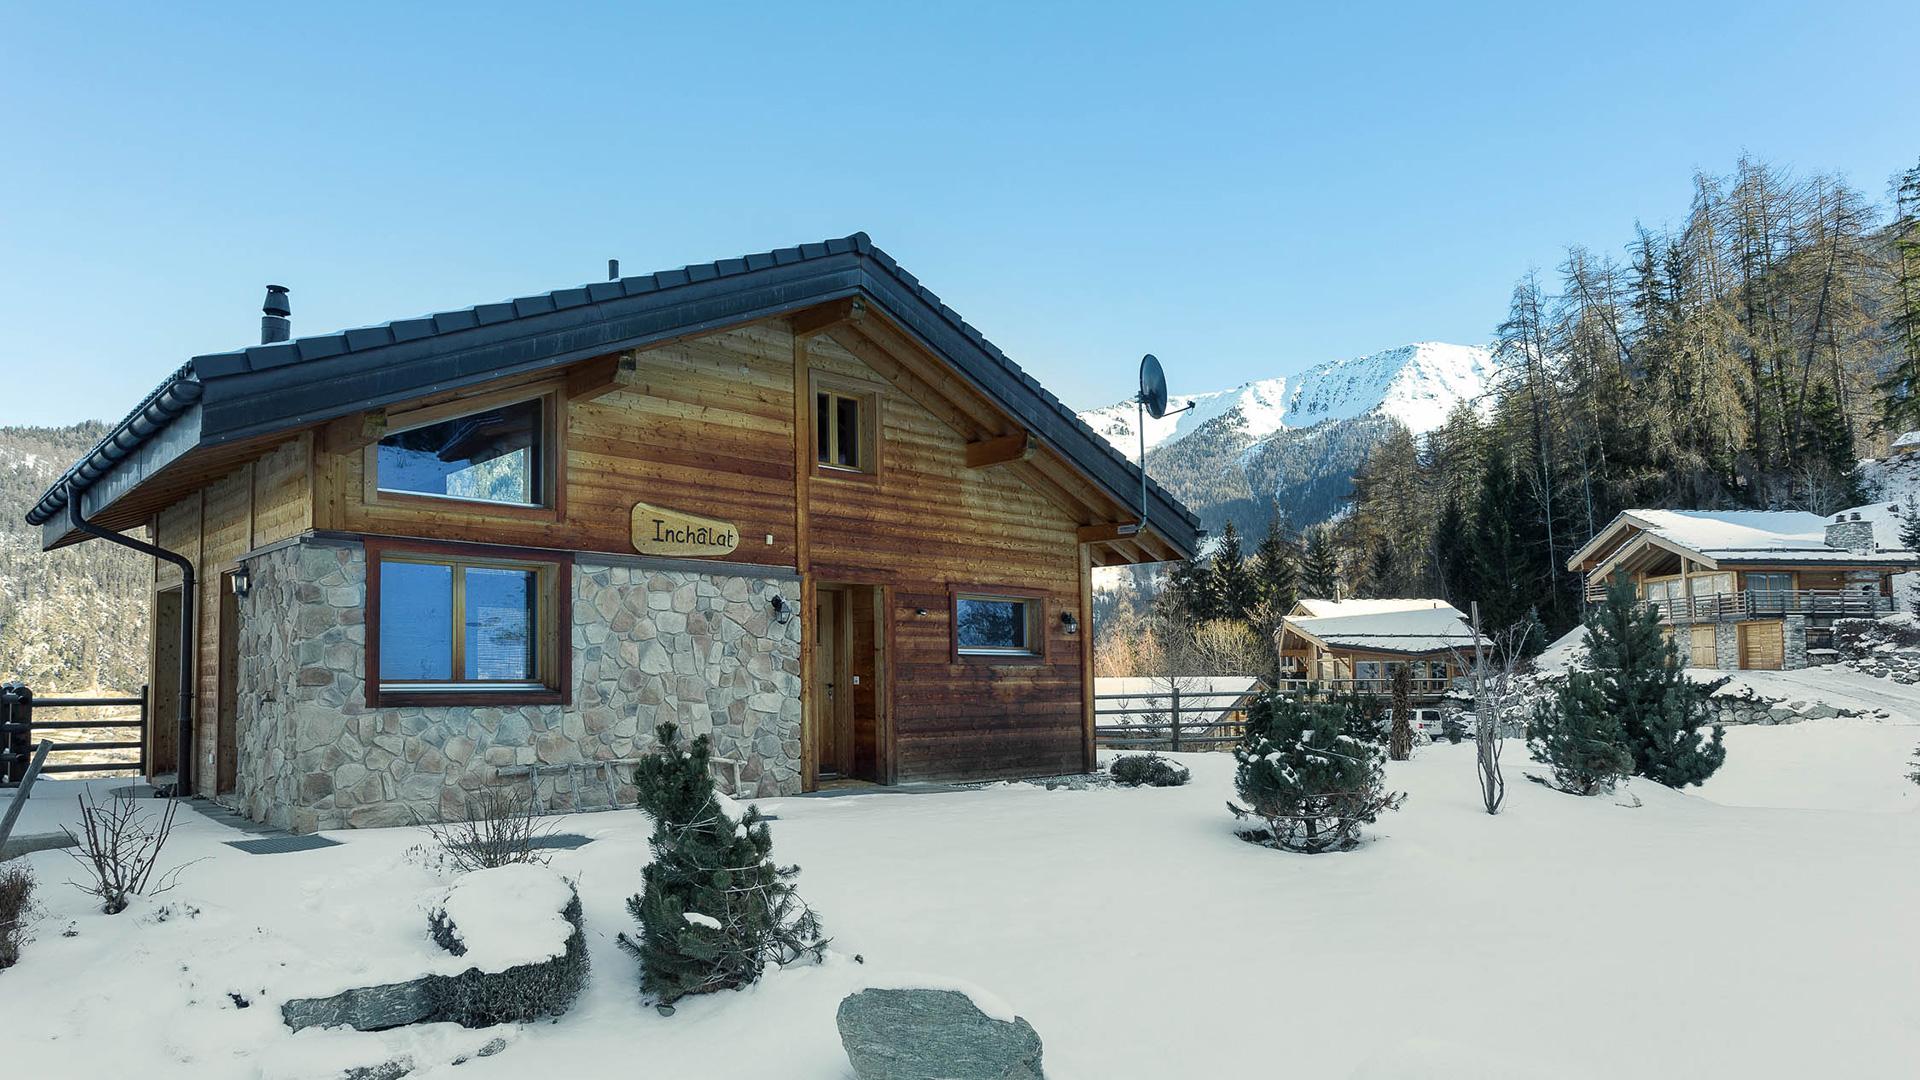 Chalet Inchalat Chalet, Switzerland